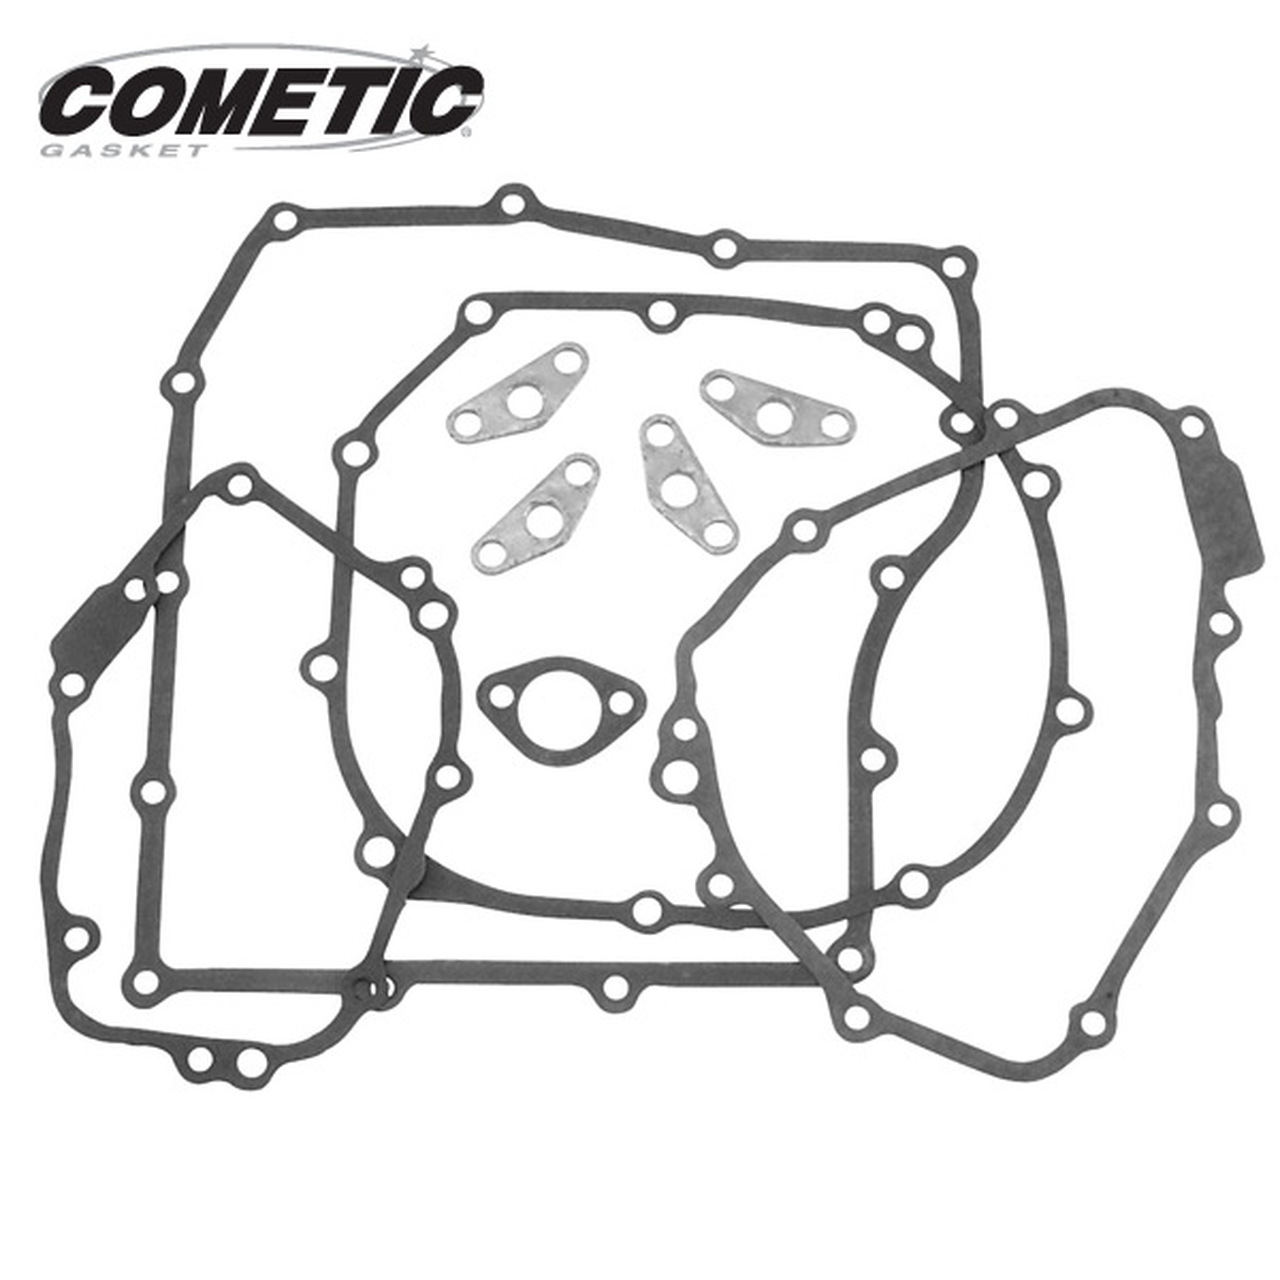 Cometic Suzuki GS1100-1150 All Engine Gasket Kit